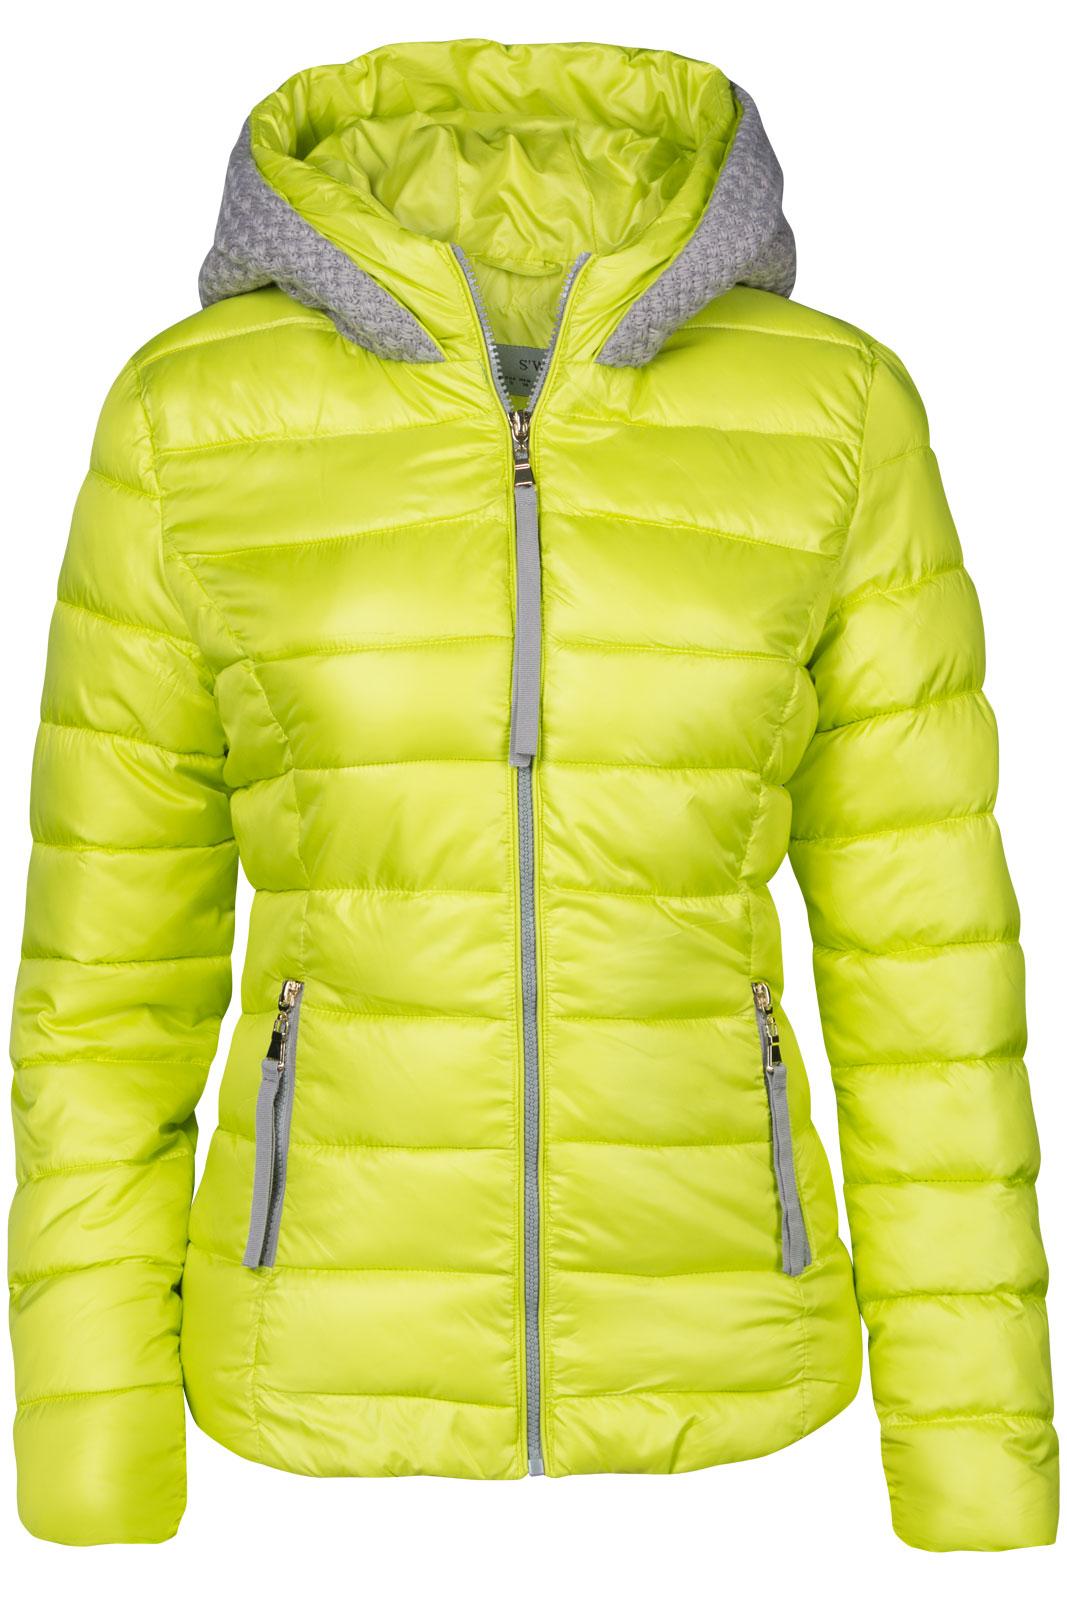 damen winter jacke stepp daunen optik gestrickt kapuze skijacke mantel kurz ebay. Black Bedroom Furniture Sets. Home Design Ideas